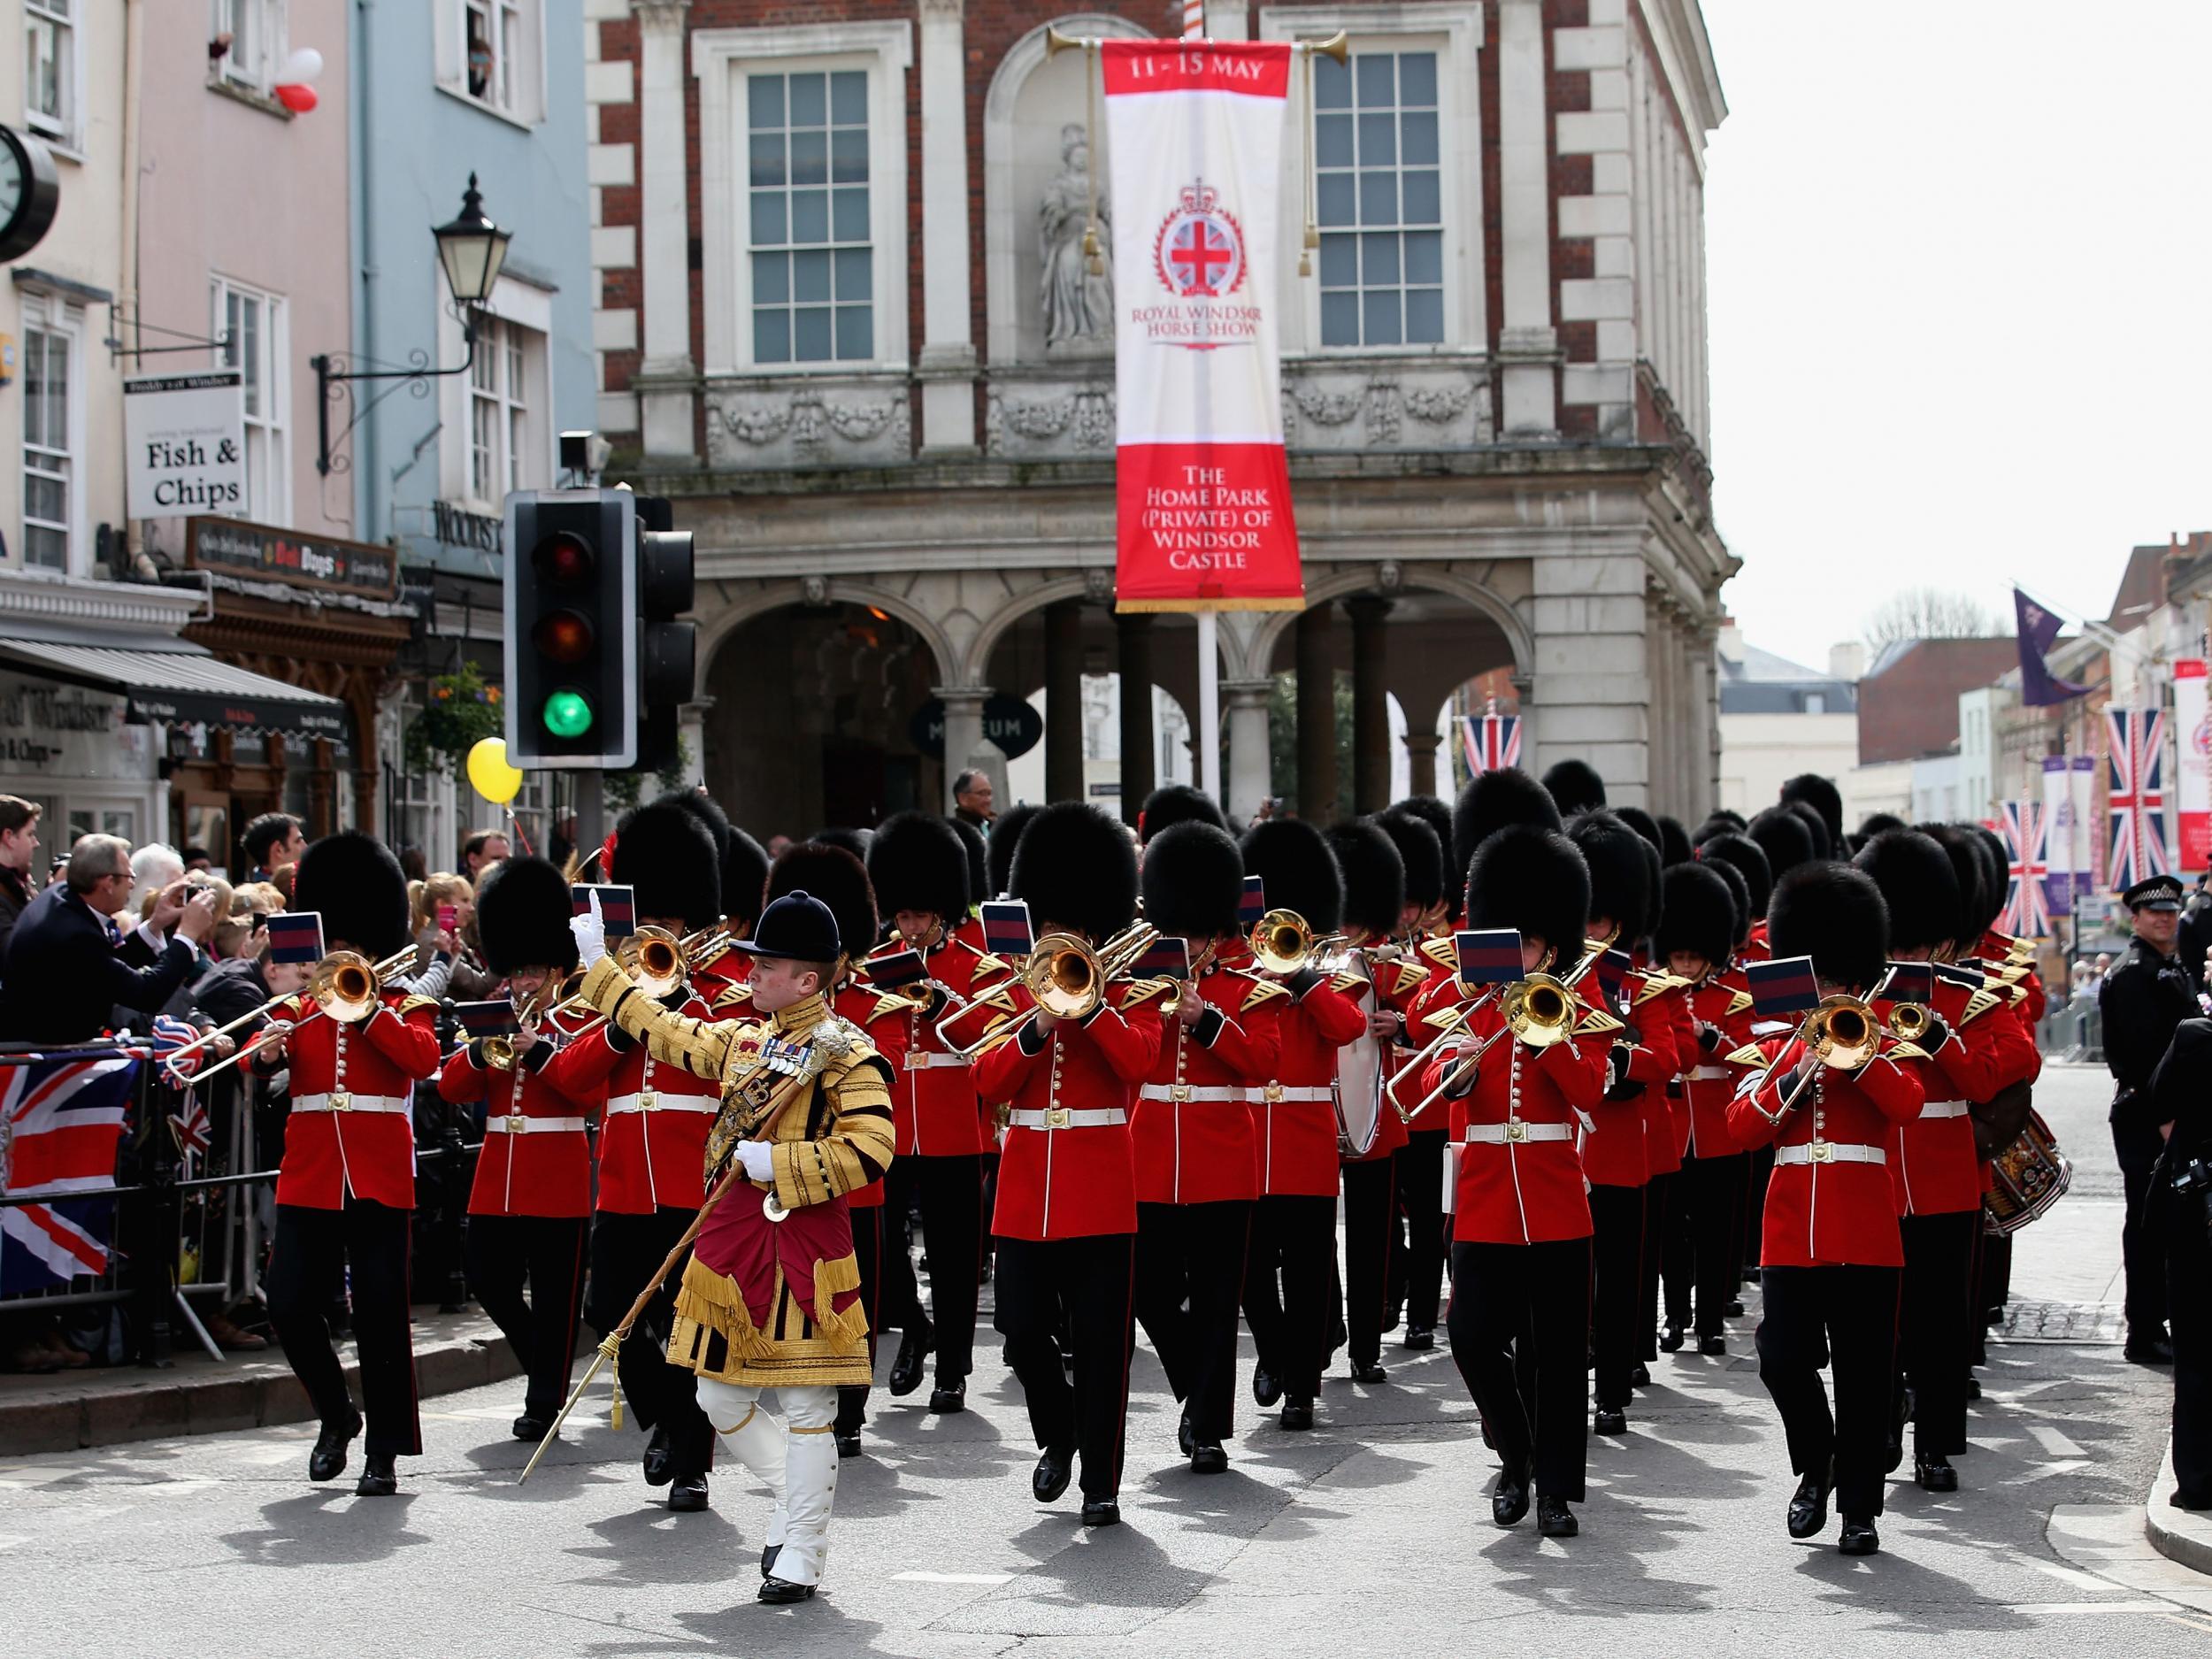 Queens Birthday Watch Live As Elizabeth II Celebrates Turning 90